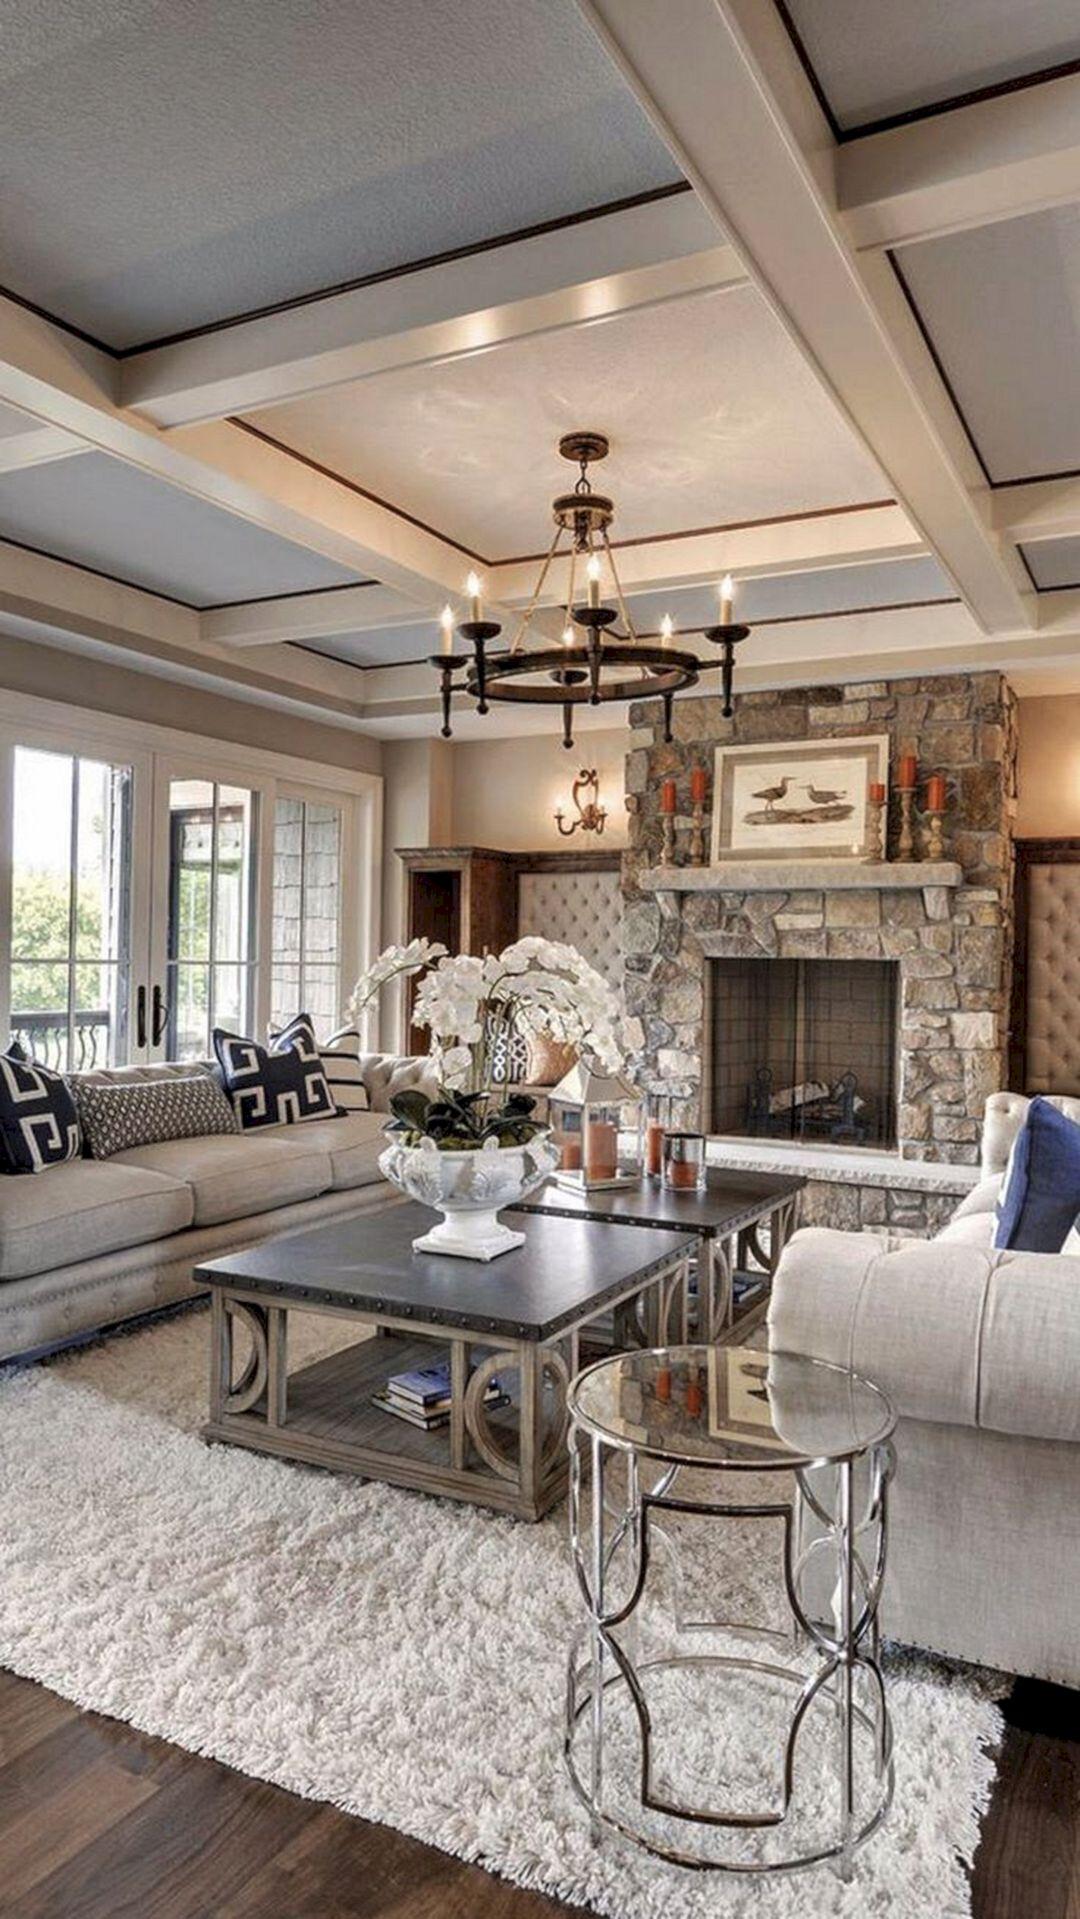 Chic Living Room Decorating Ideas And Design 44 Freshouz